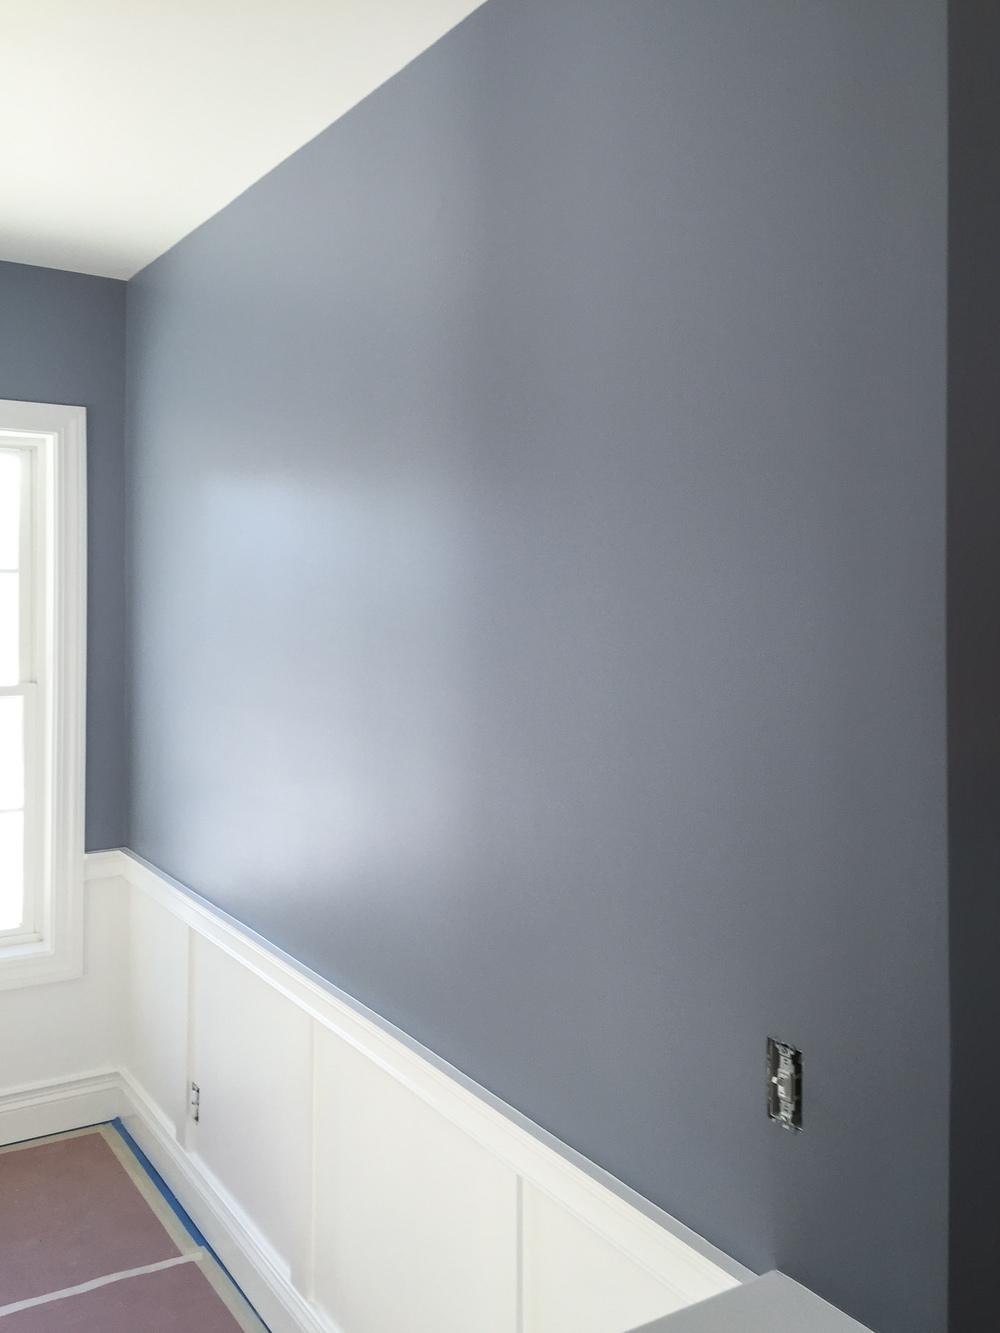 big-dog-painting-interior-with-paneling.jpg